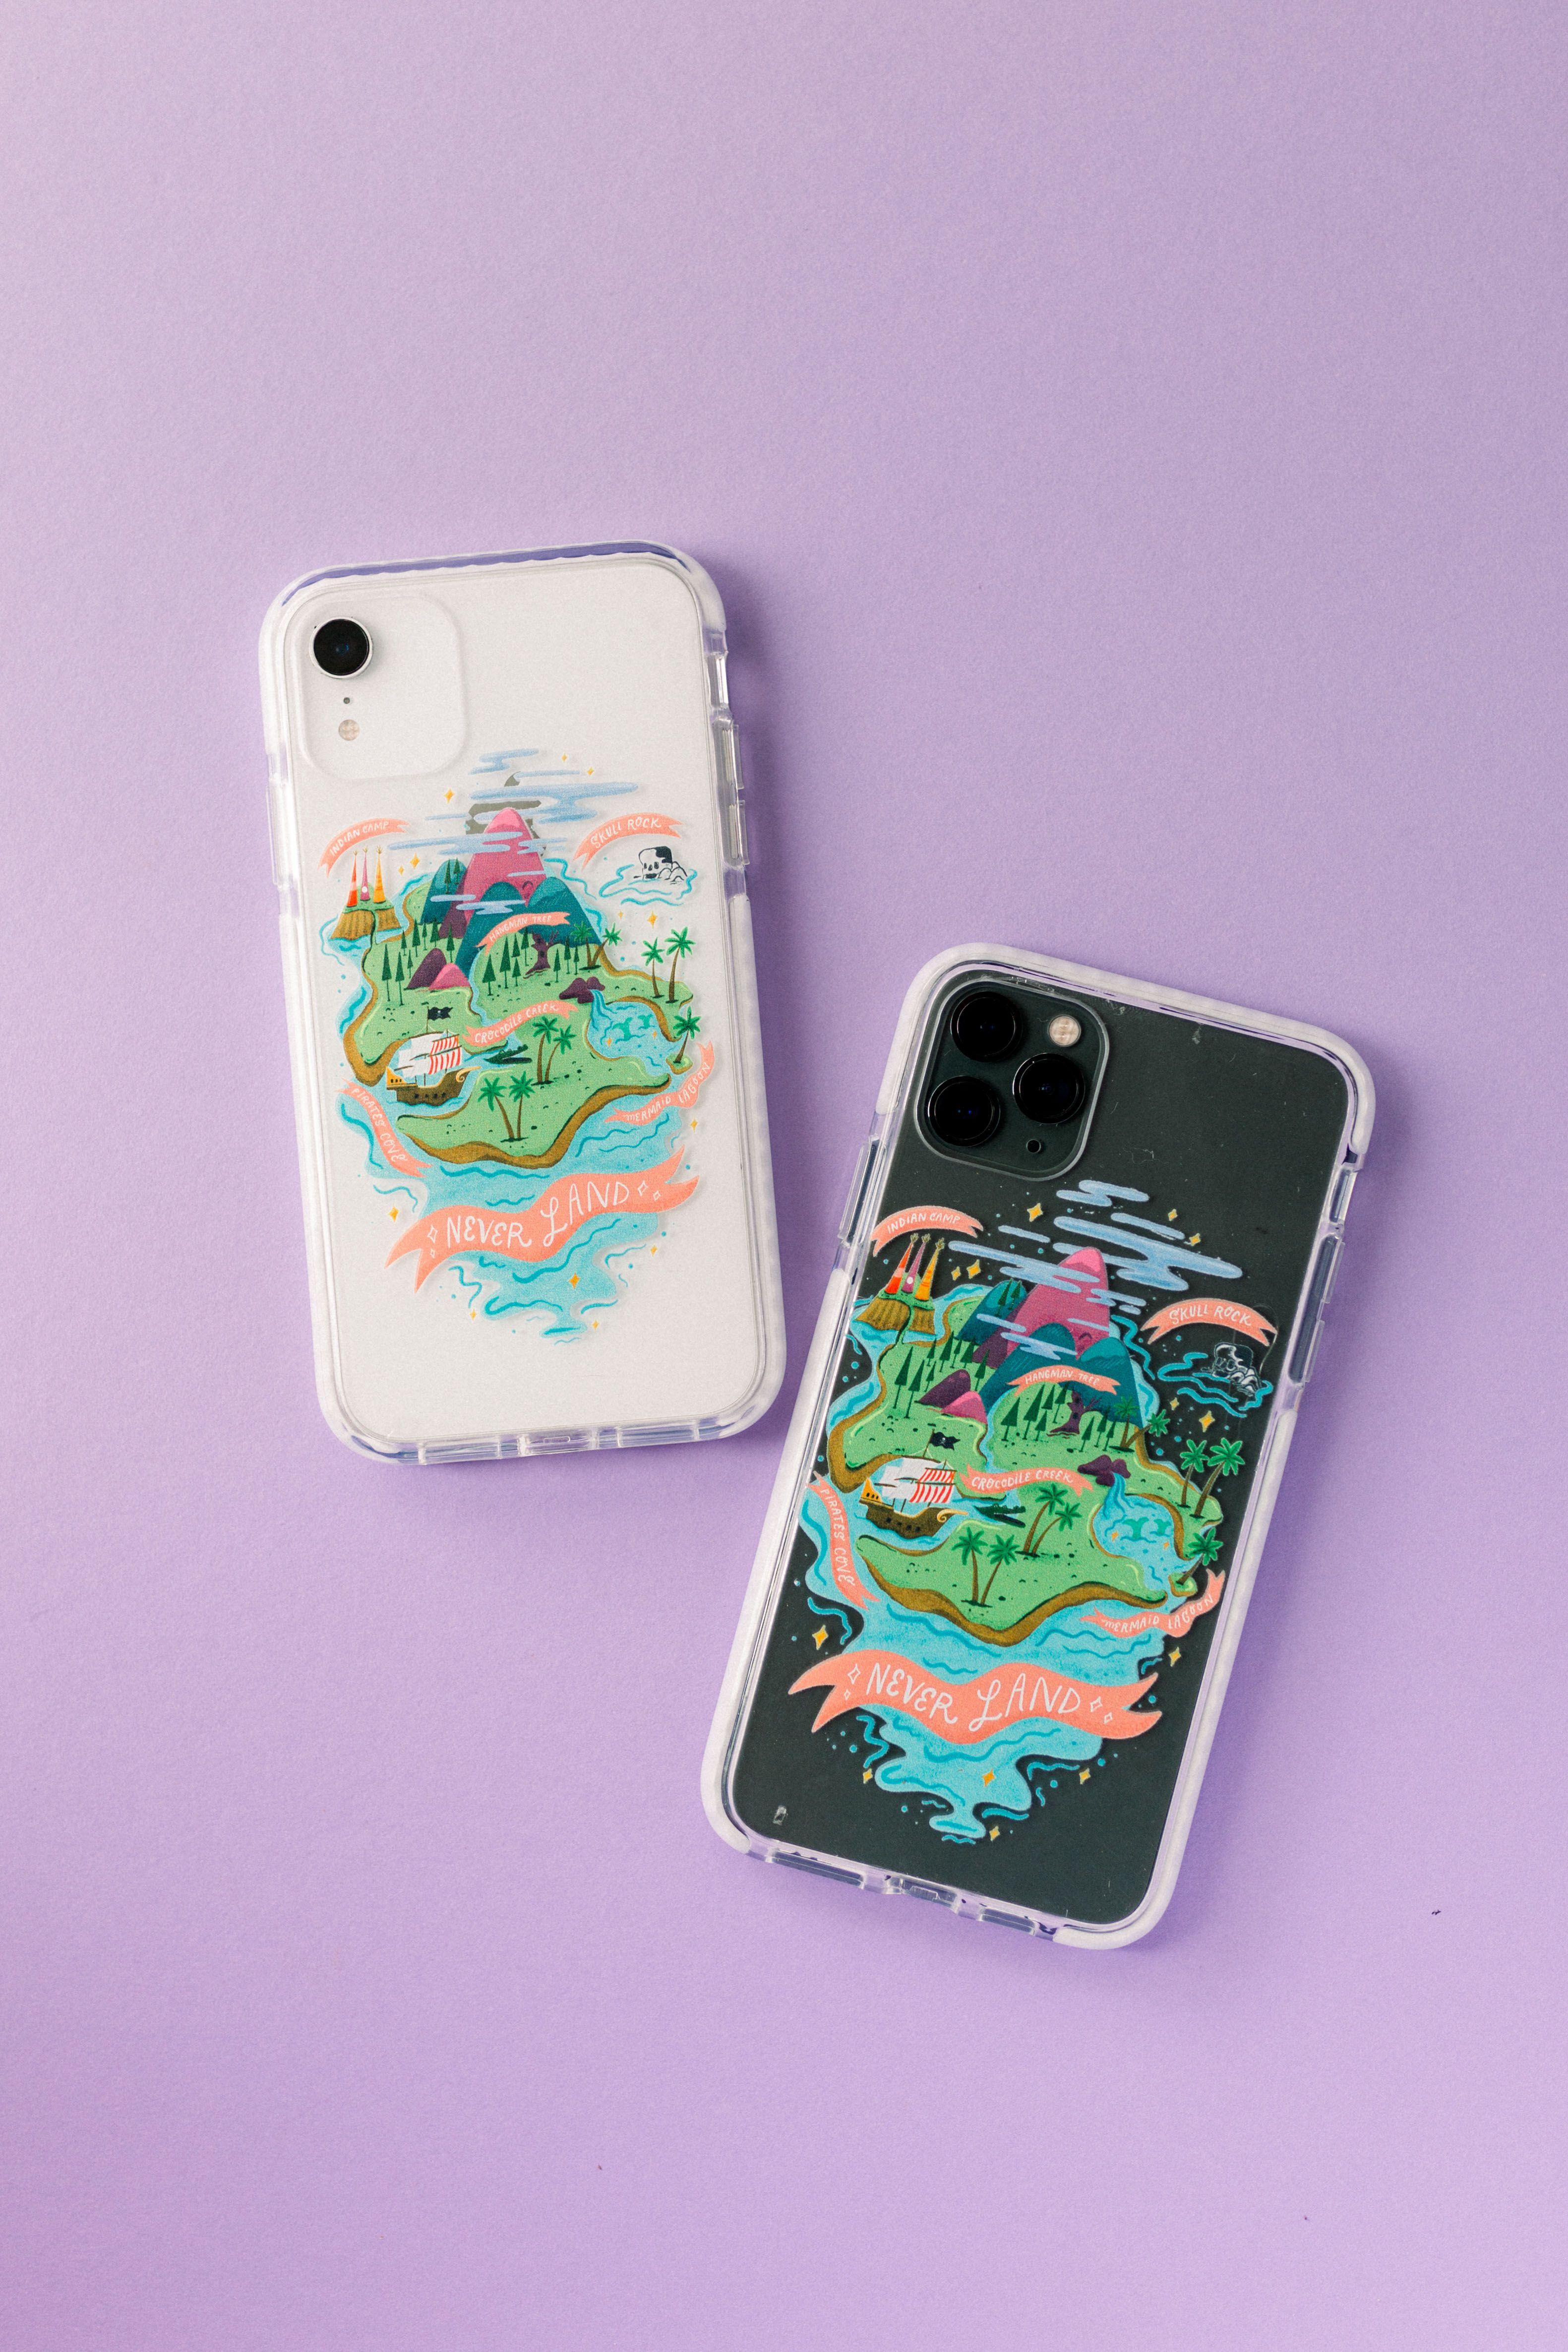 Off To Neverland Disney Phone Cases Disney Iphone Iphone Phone Cases